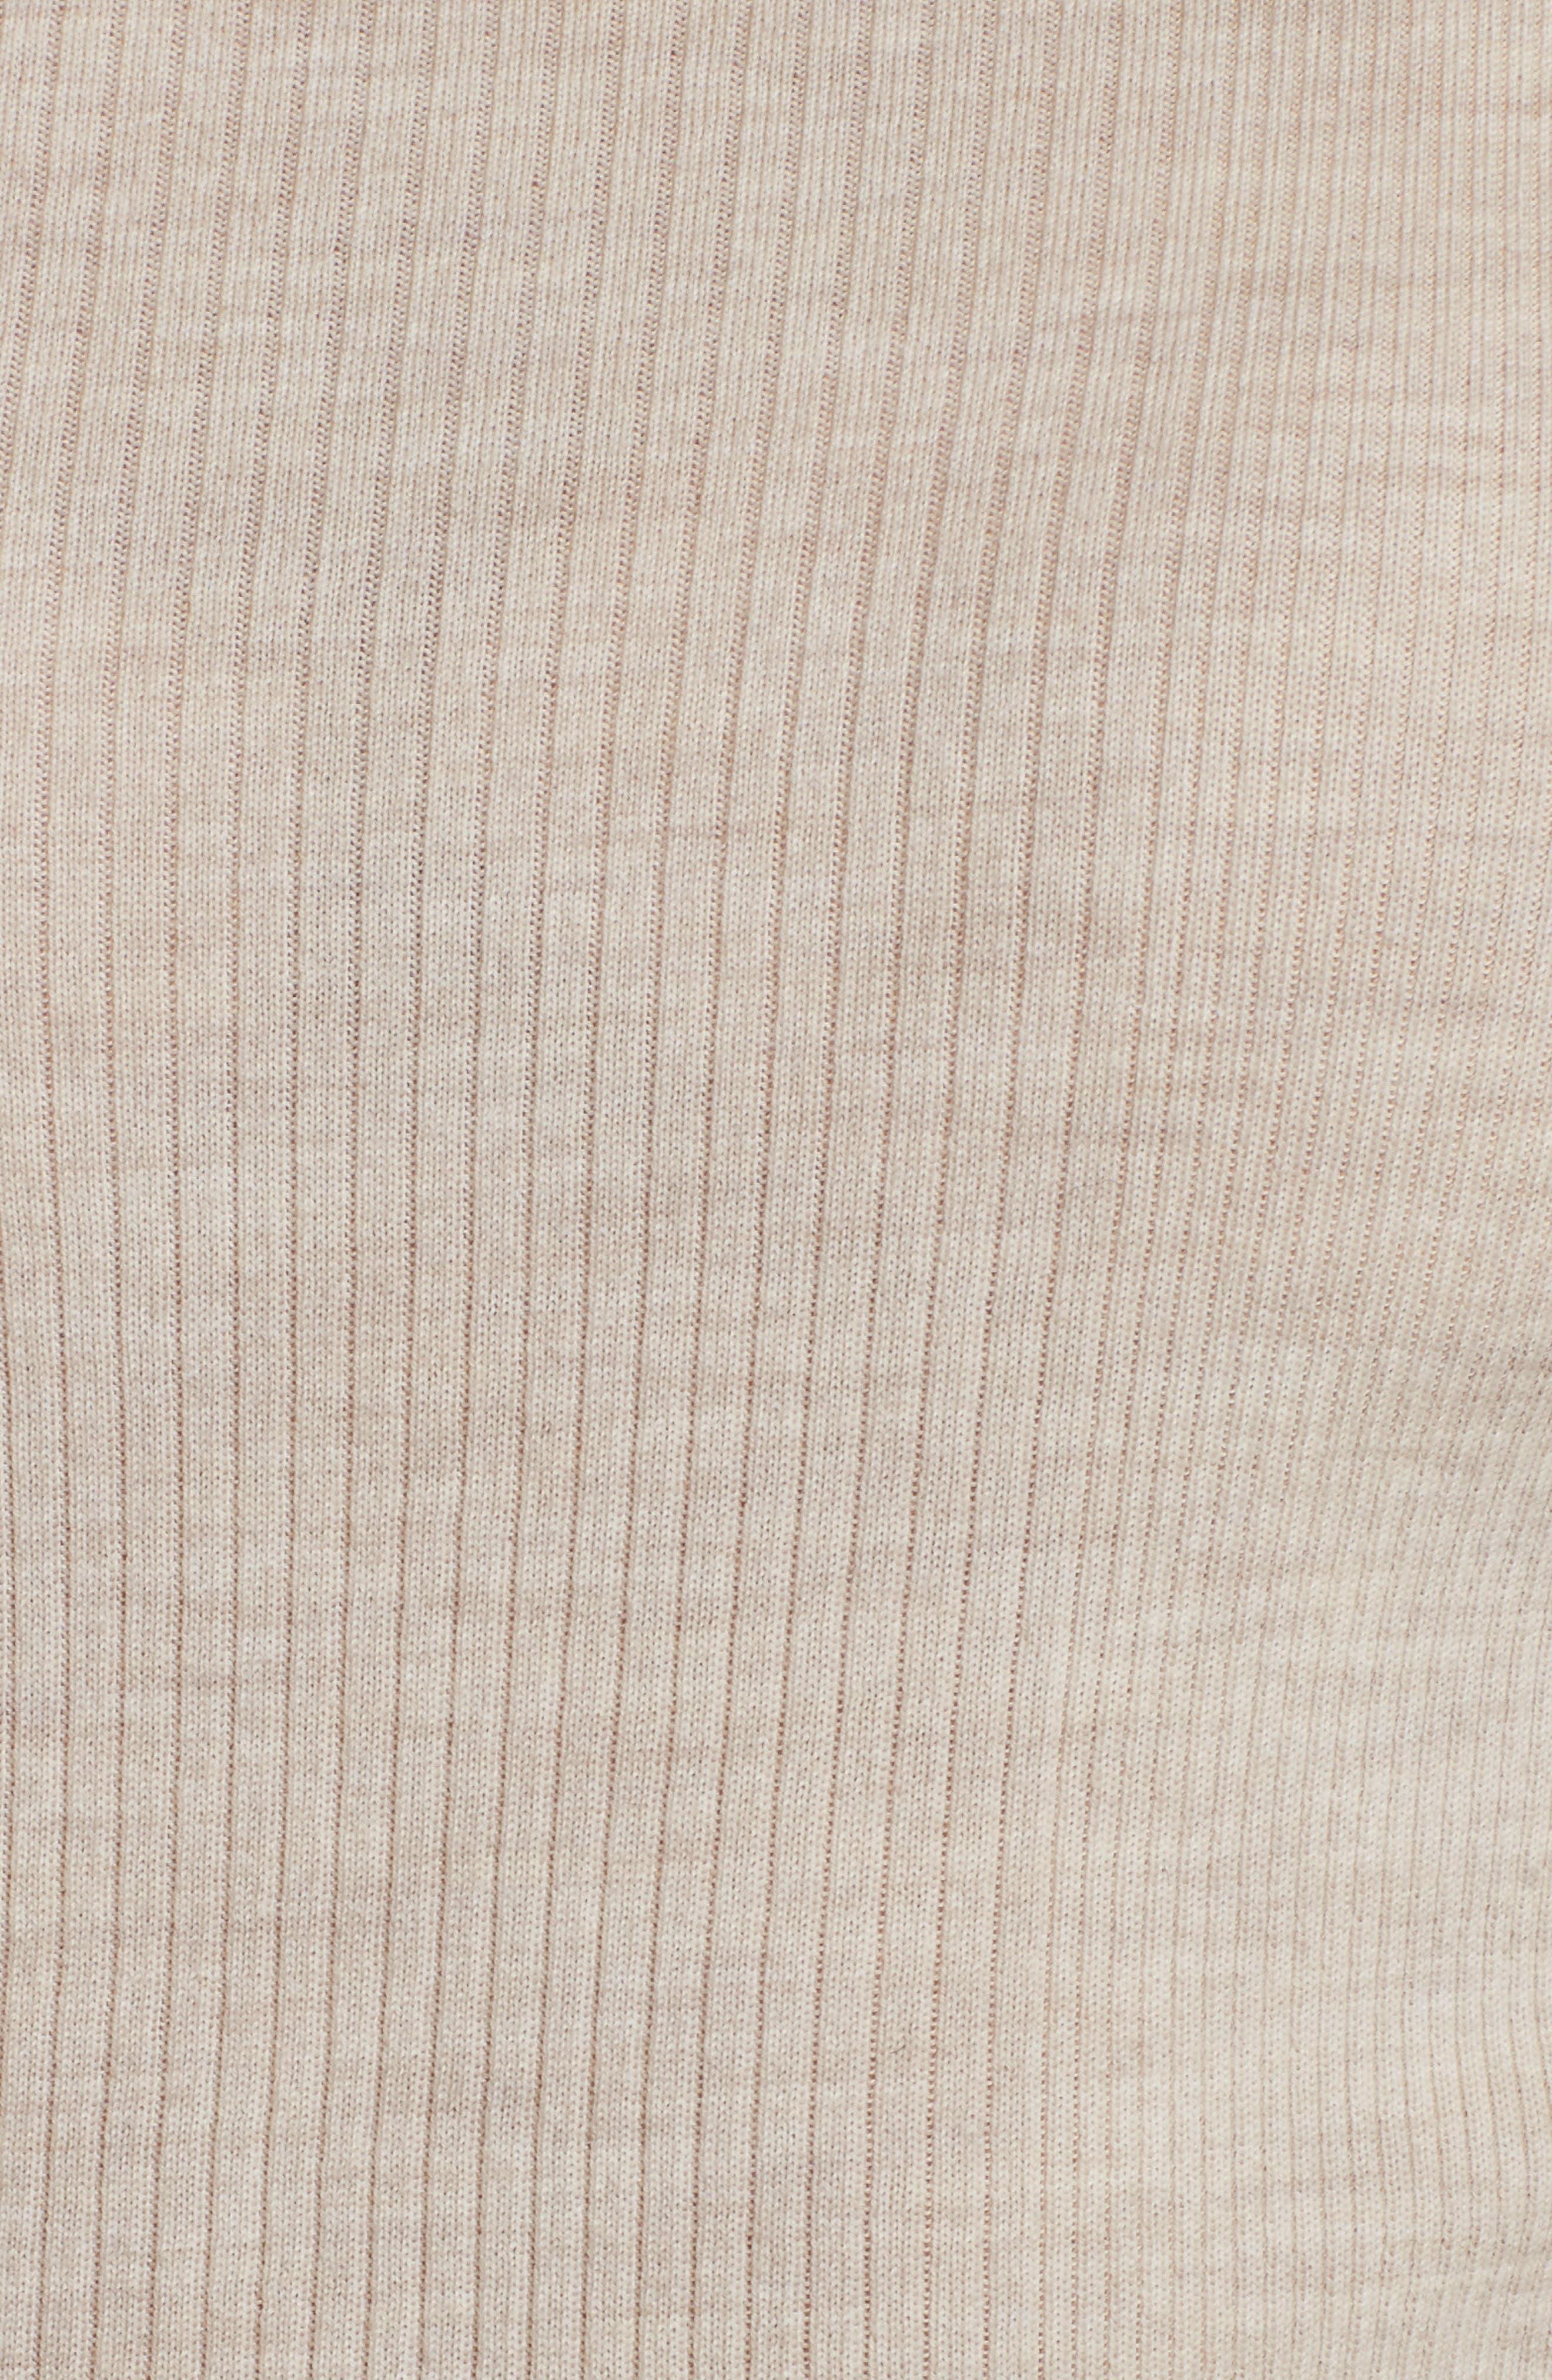 Merino Wool Blend Sweater,                             Alternate thumbnail 5, color,                             254